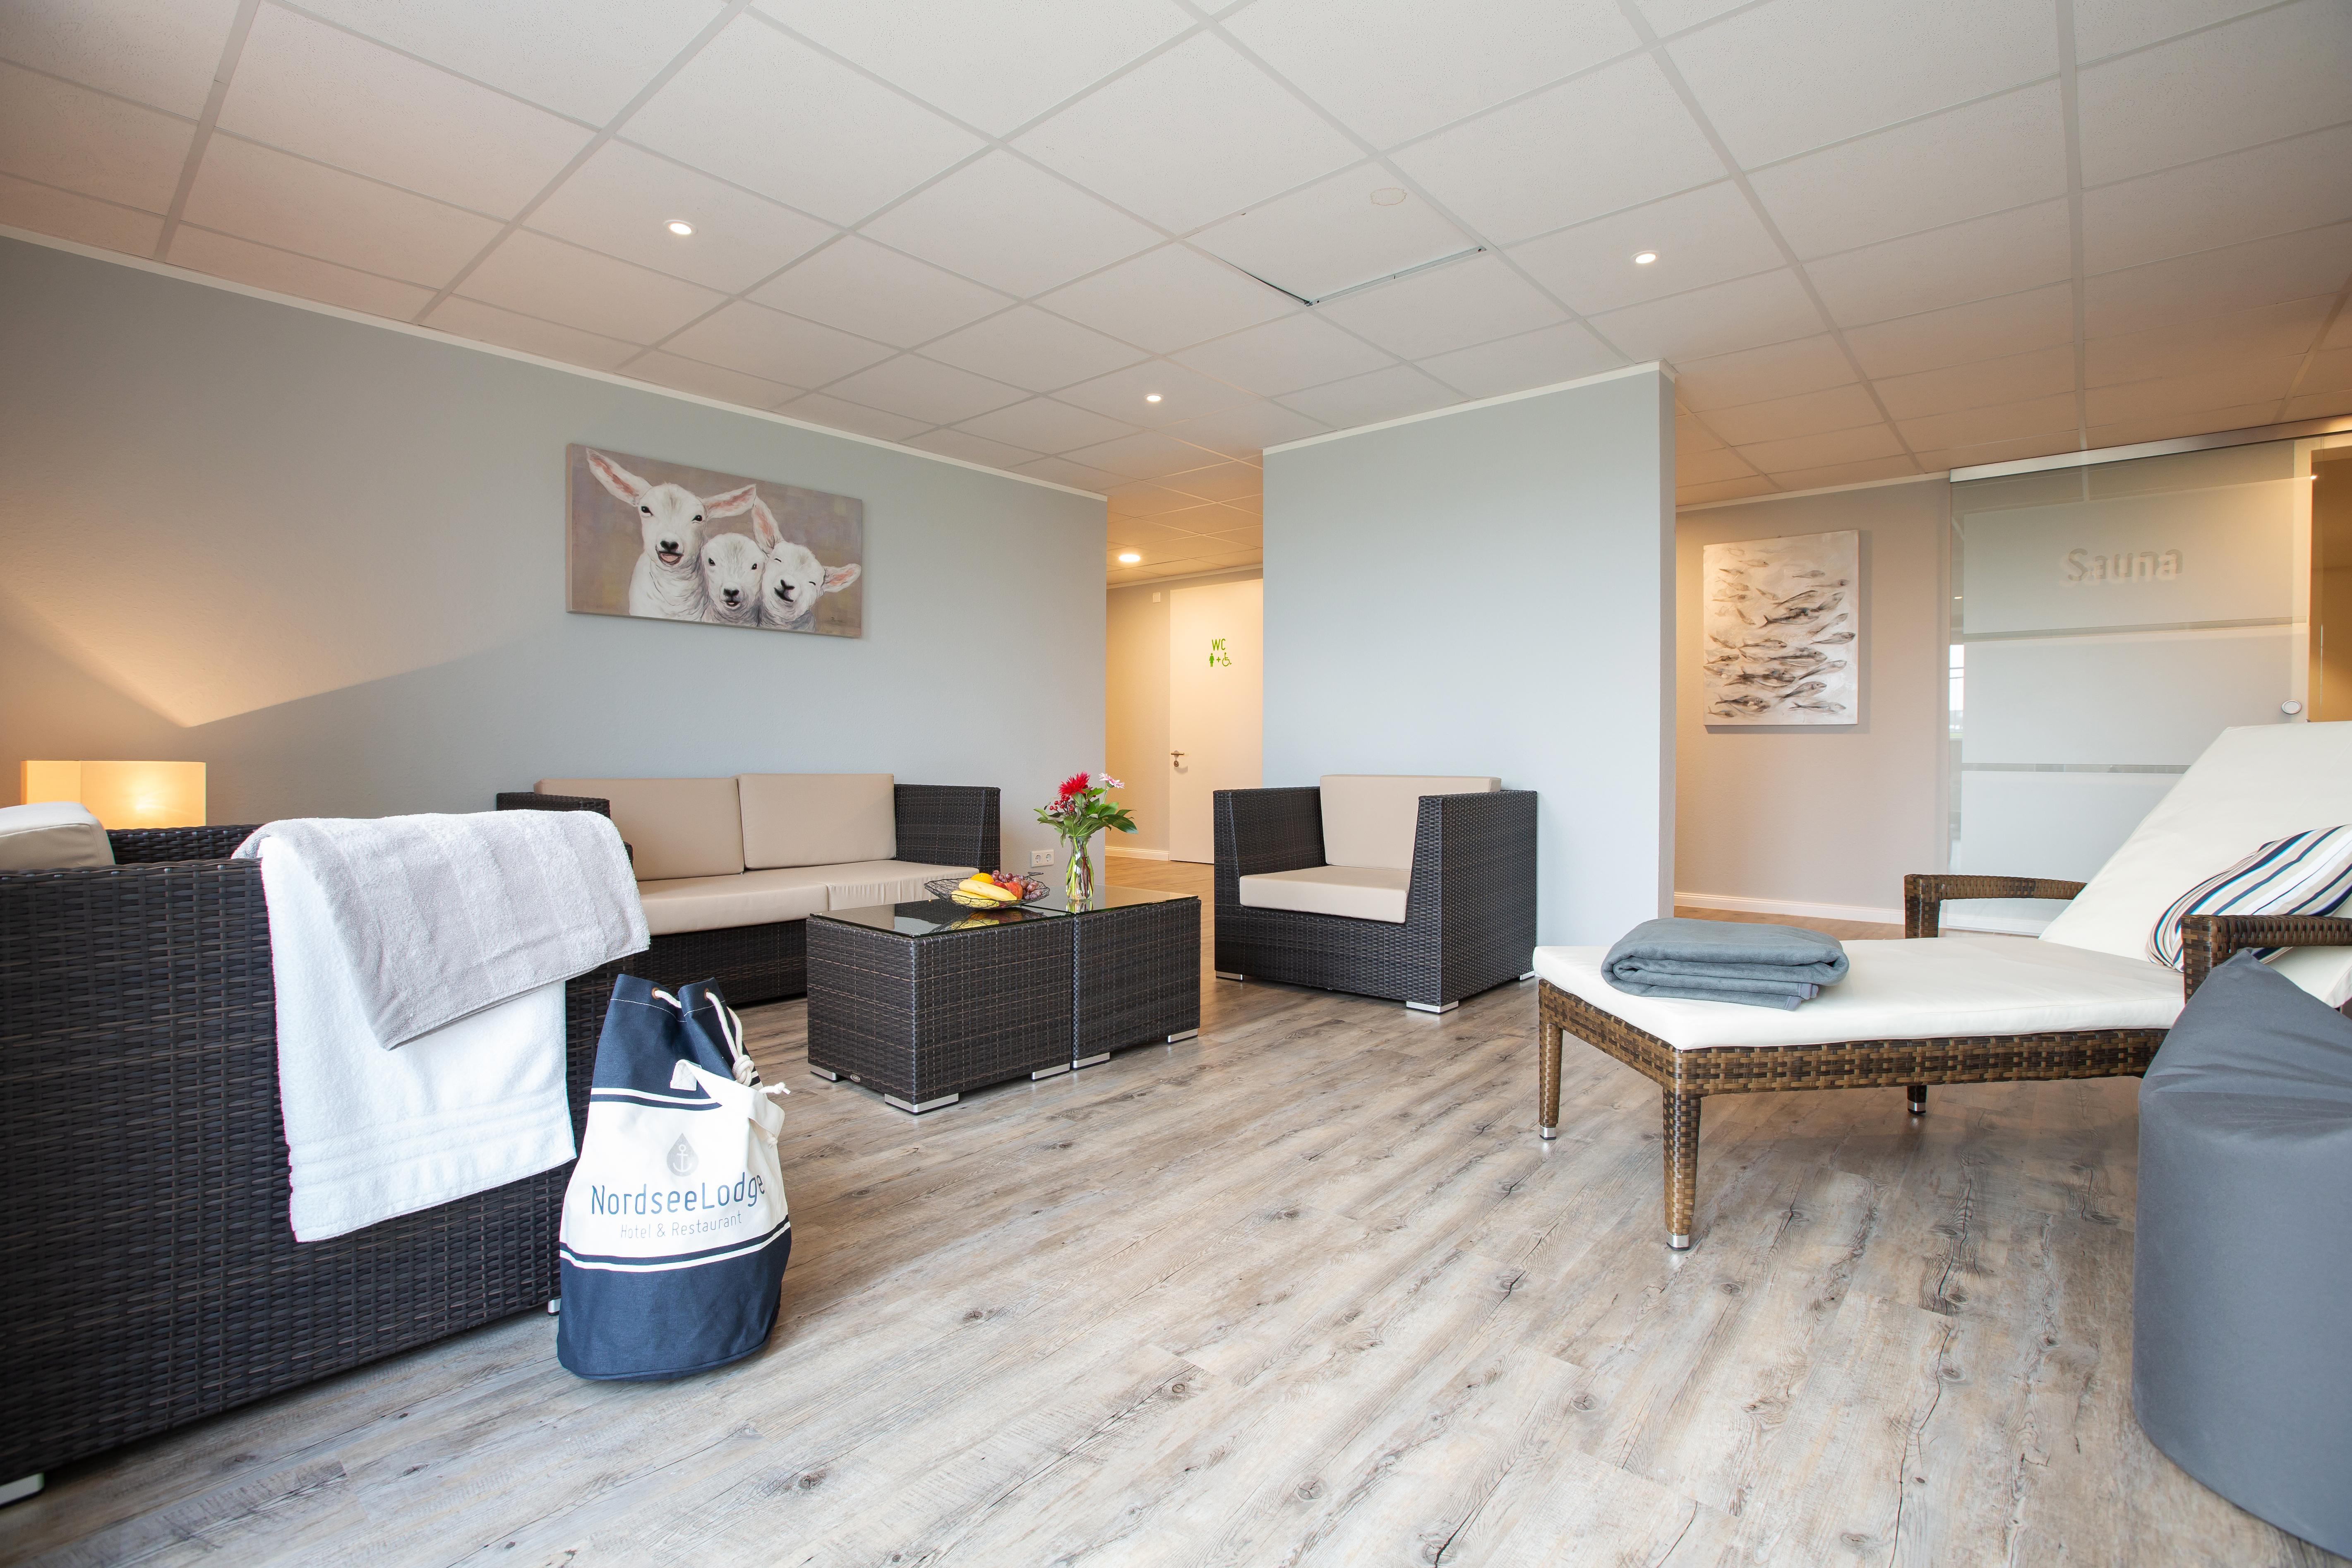 Nordsee Lodge Wellnessbereich Pellworm